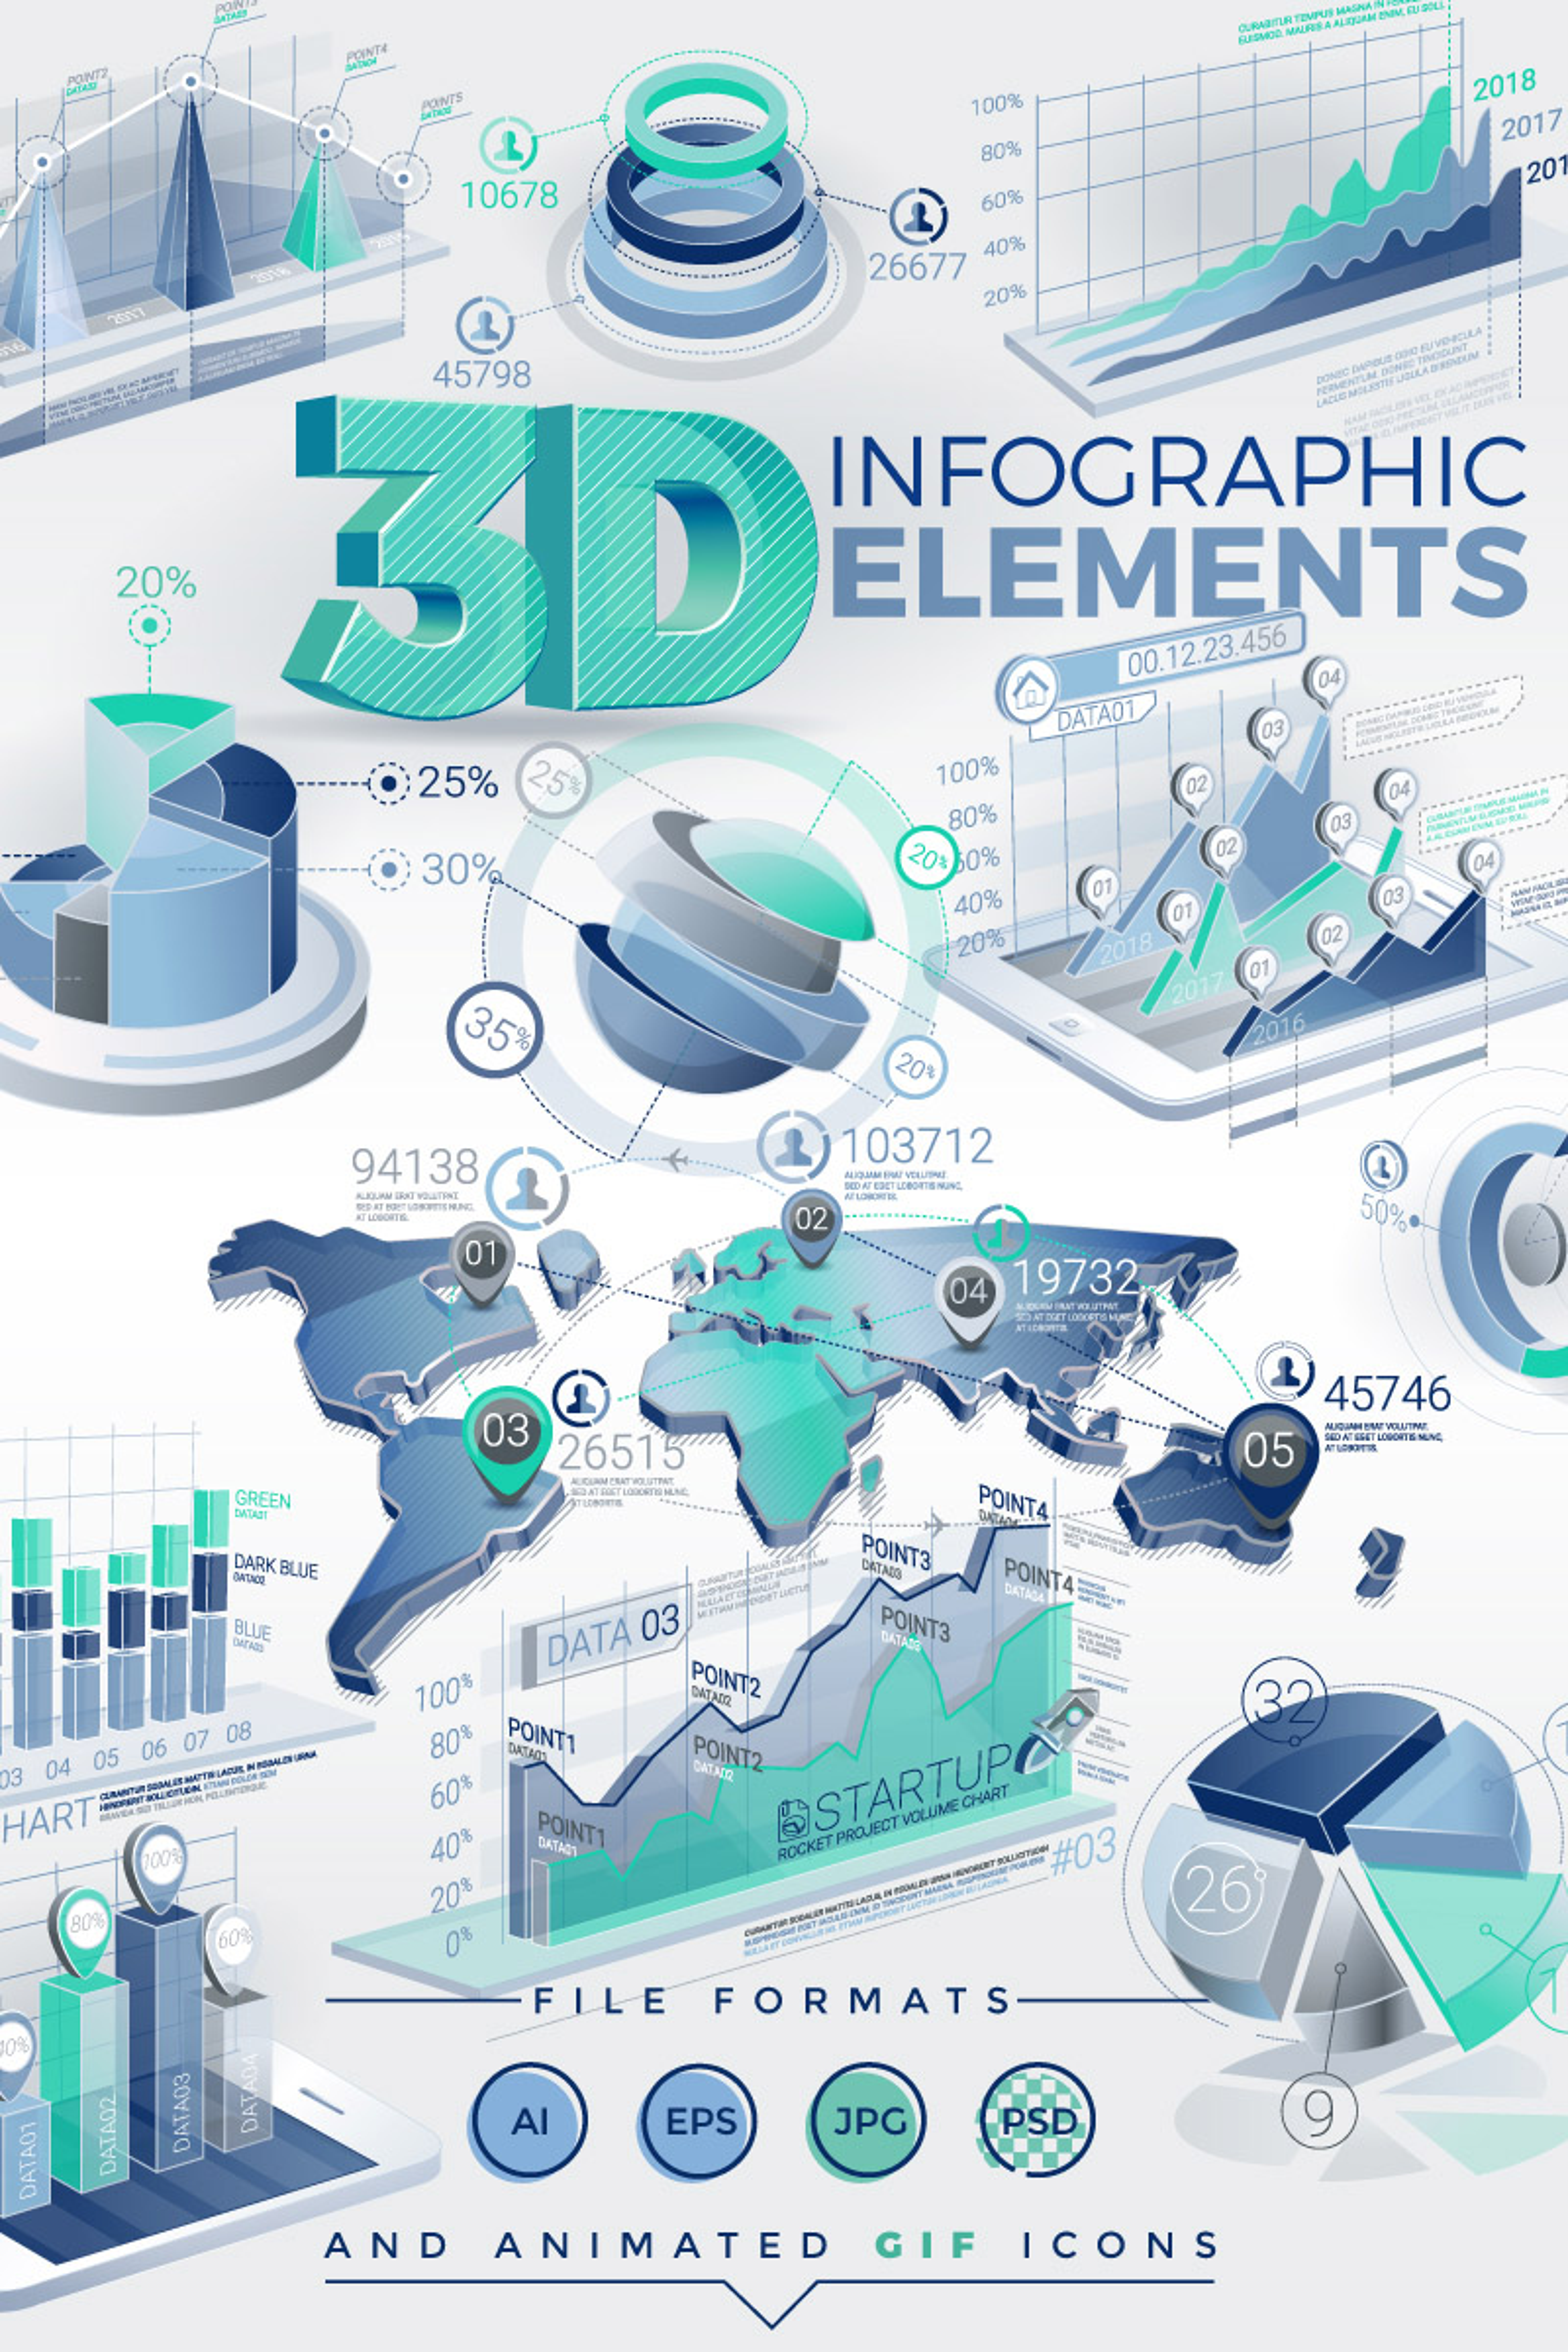 3D Infographic Elements - screenshot